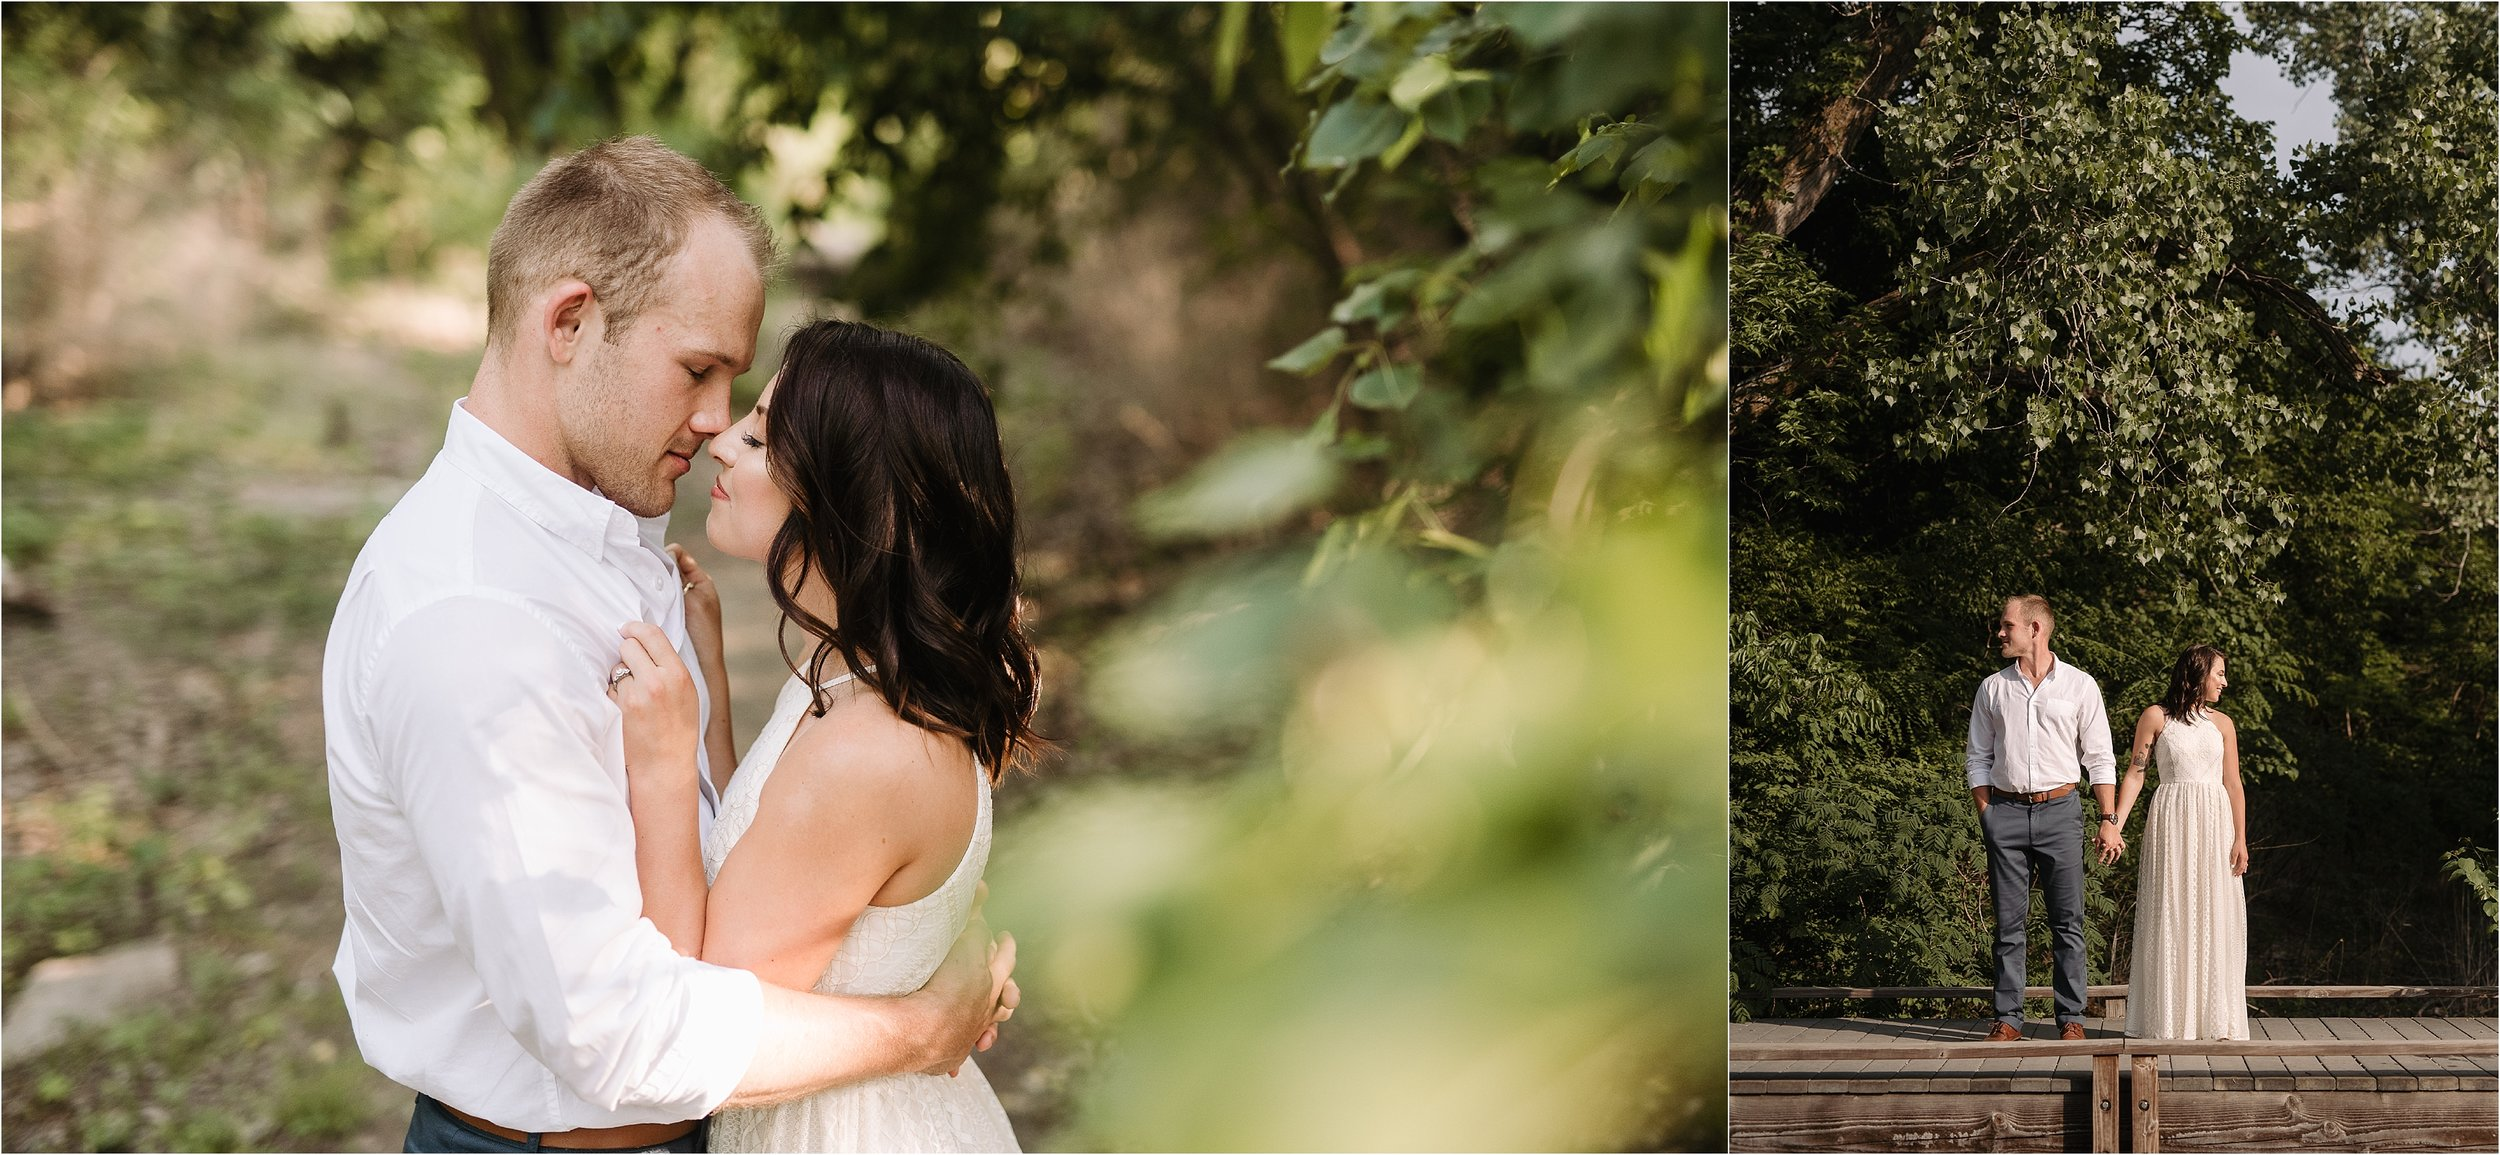 anniversary photos session oklahoma wedding photographer outdoors fall edmond okc wichita kansas norman wedding album nature outdoors white dress engagement